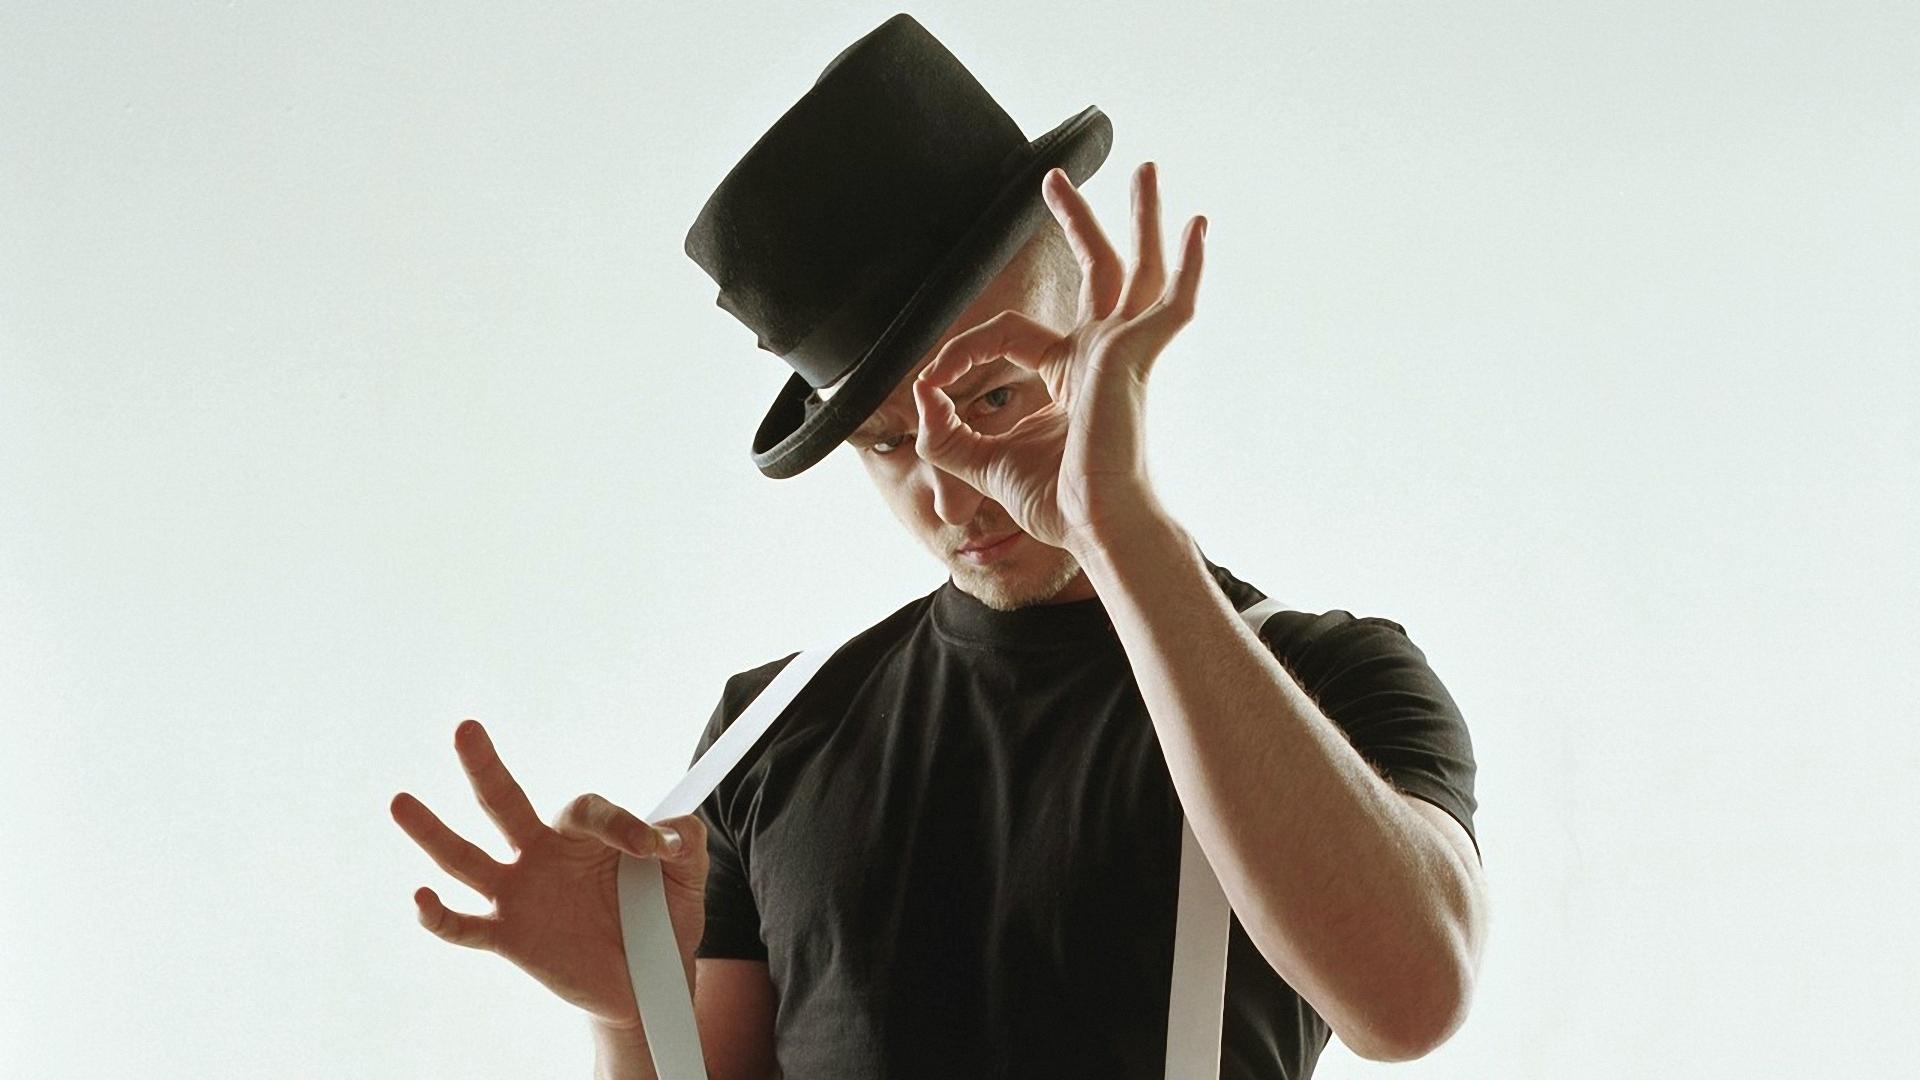 Frankie Ballenbacher within download wallpaper 1920x1080 justin timberlake, hat, suspenders, t